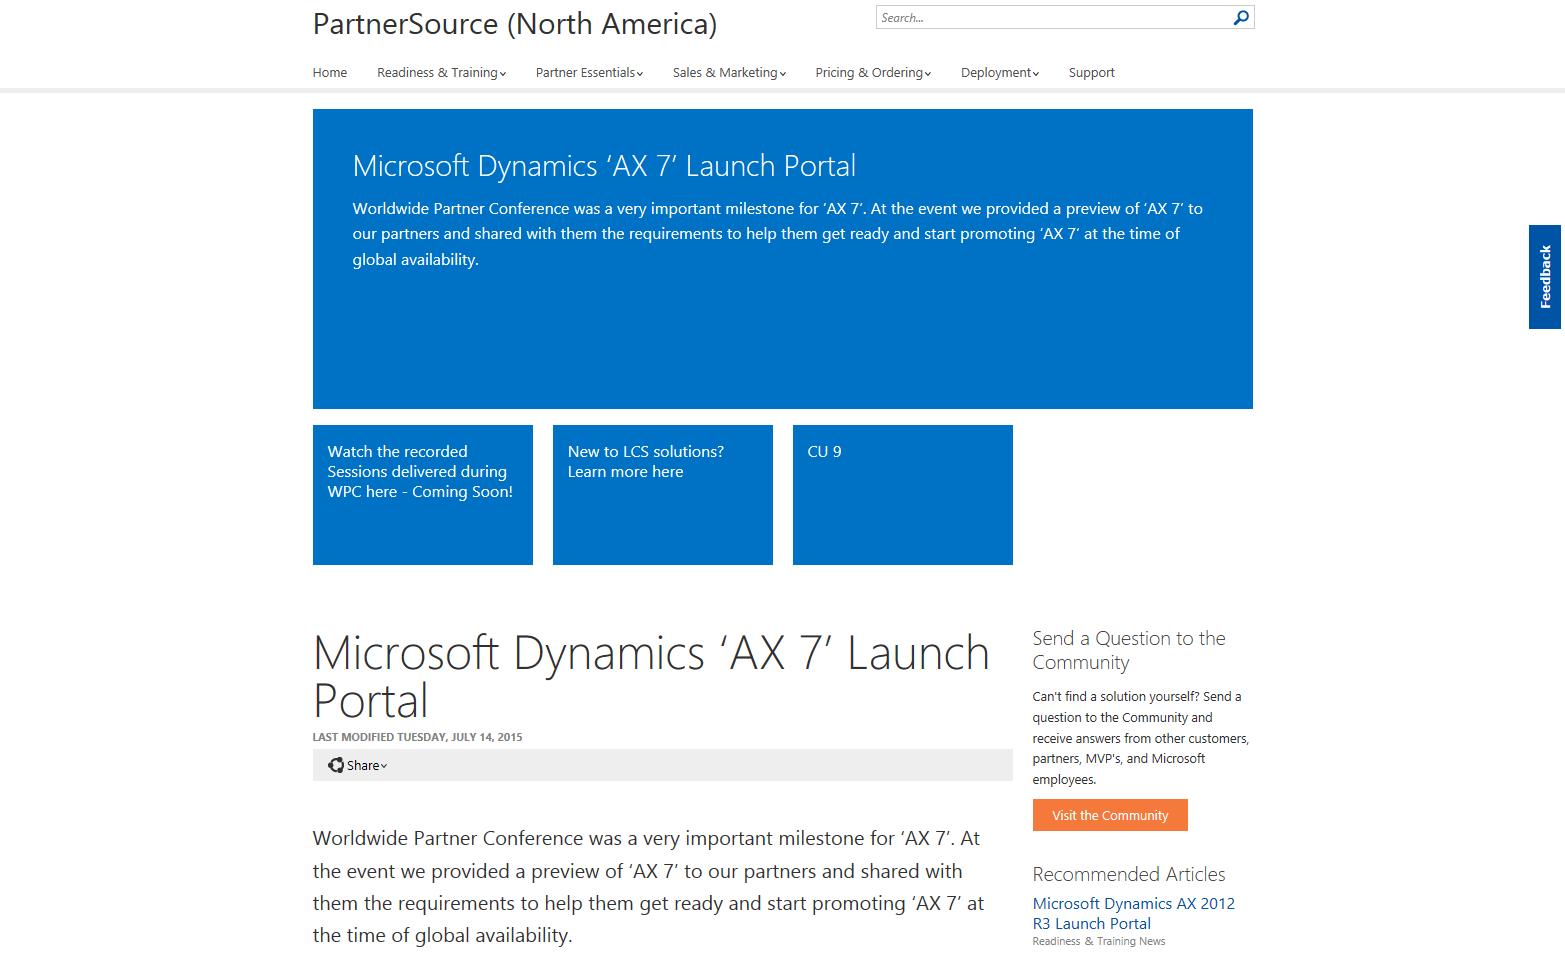 AX7 Launch Portal